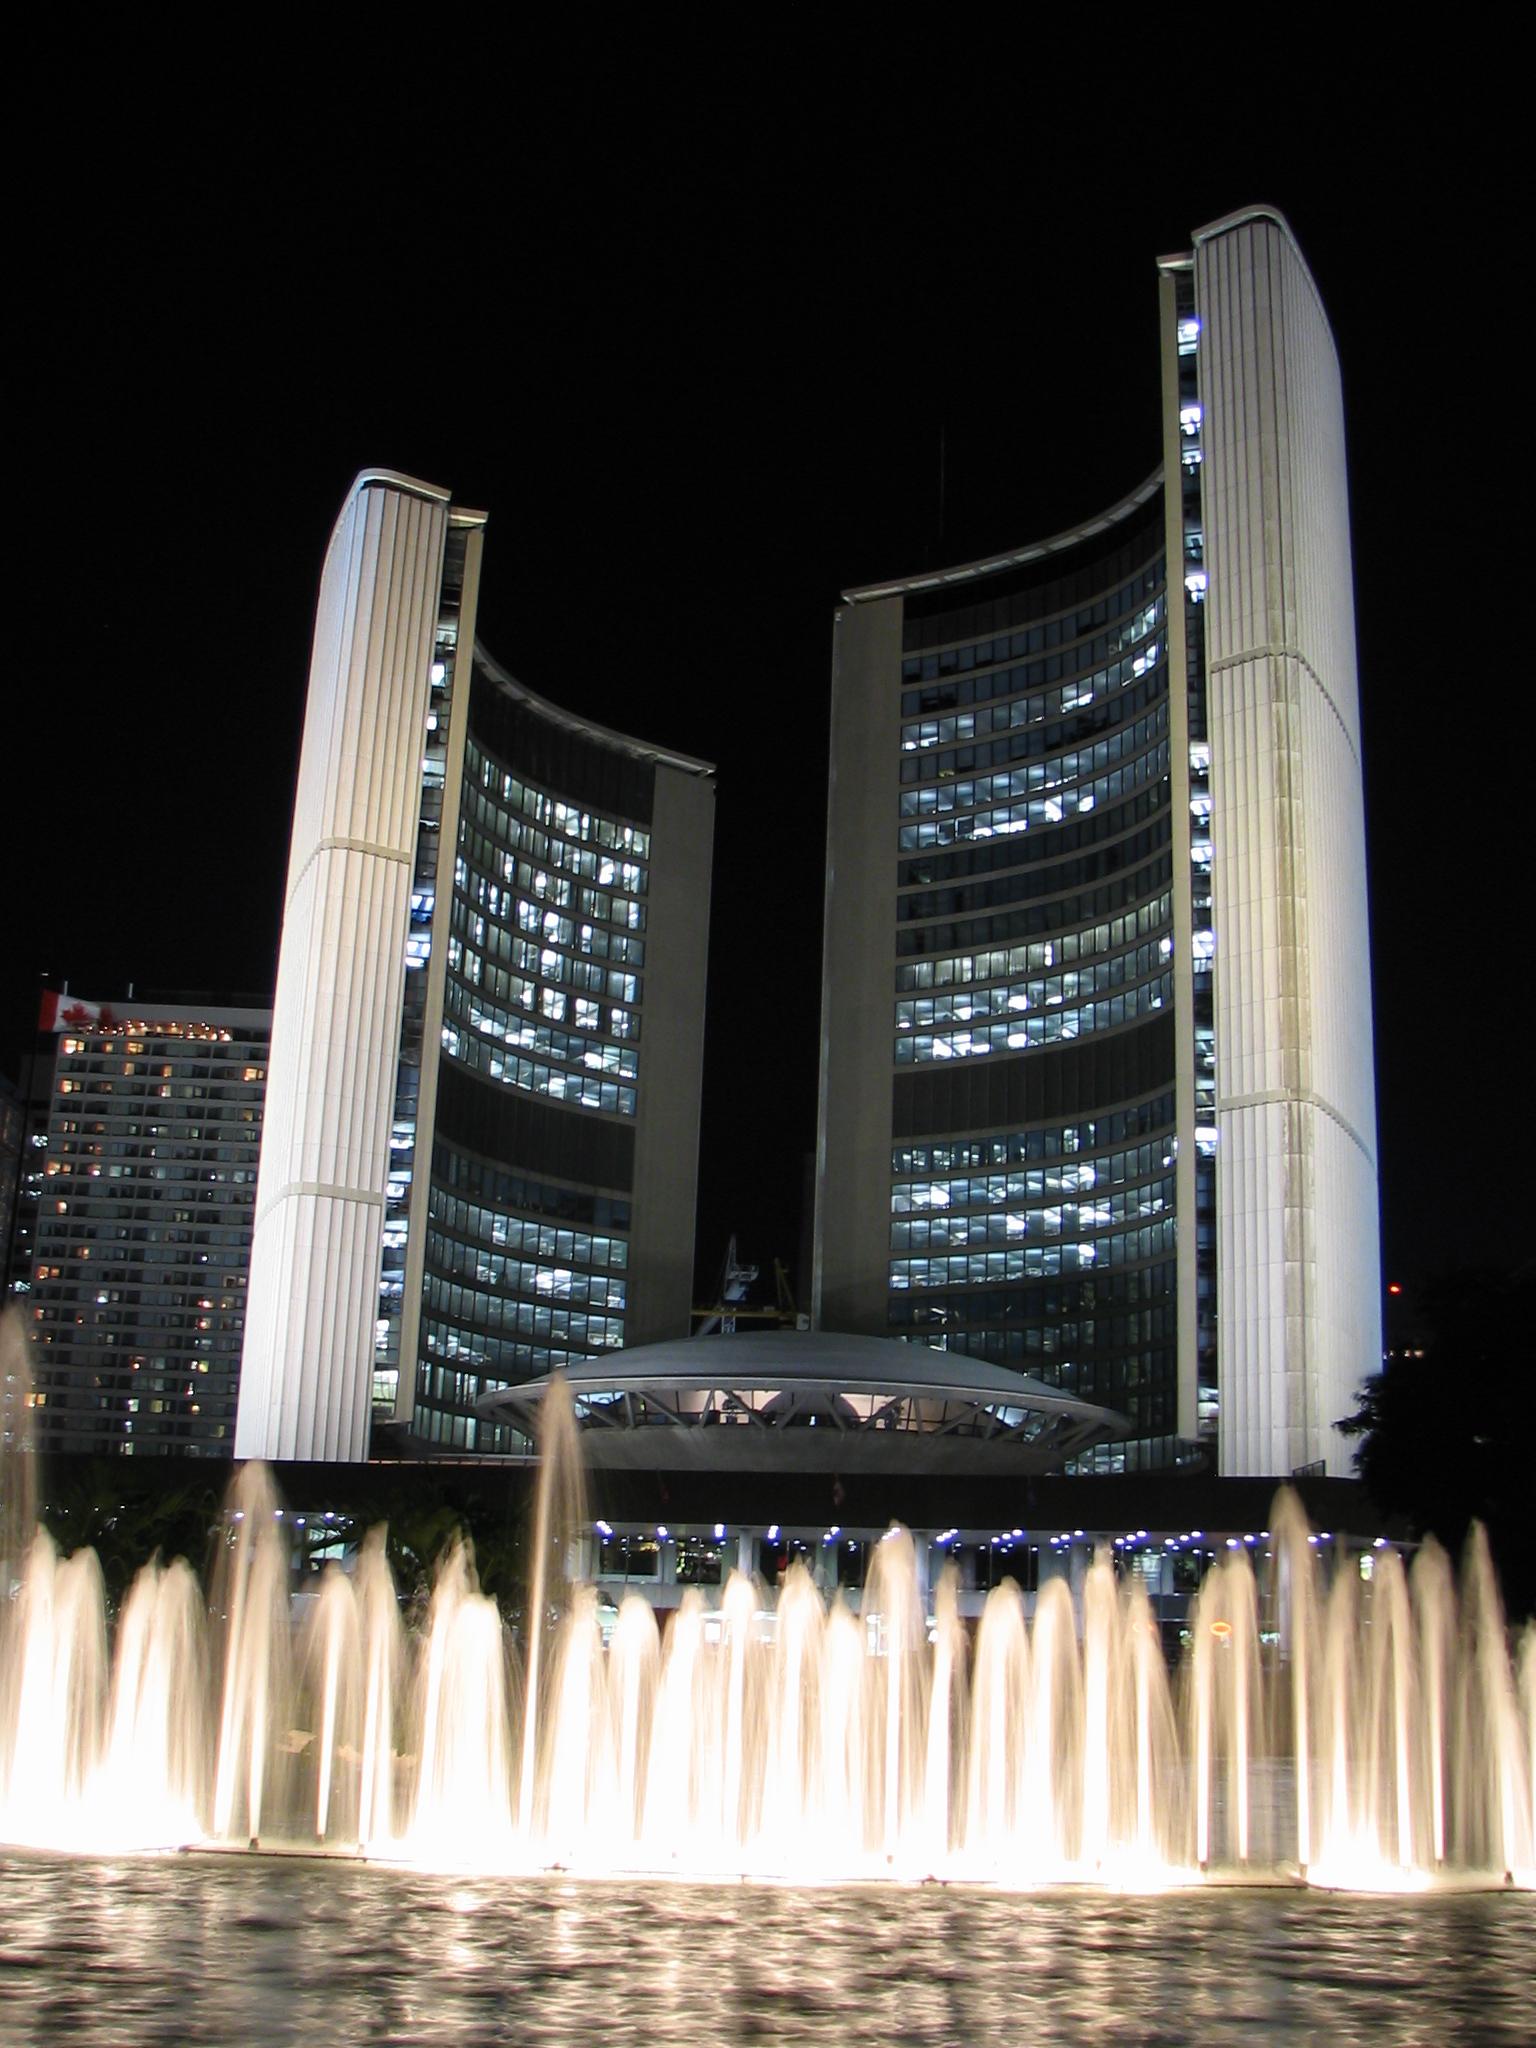 File:Toronto City Hall at night.jpg